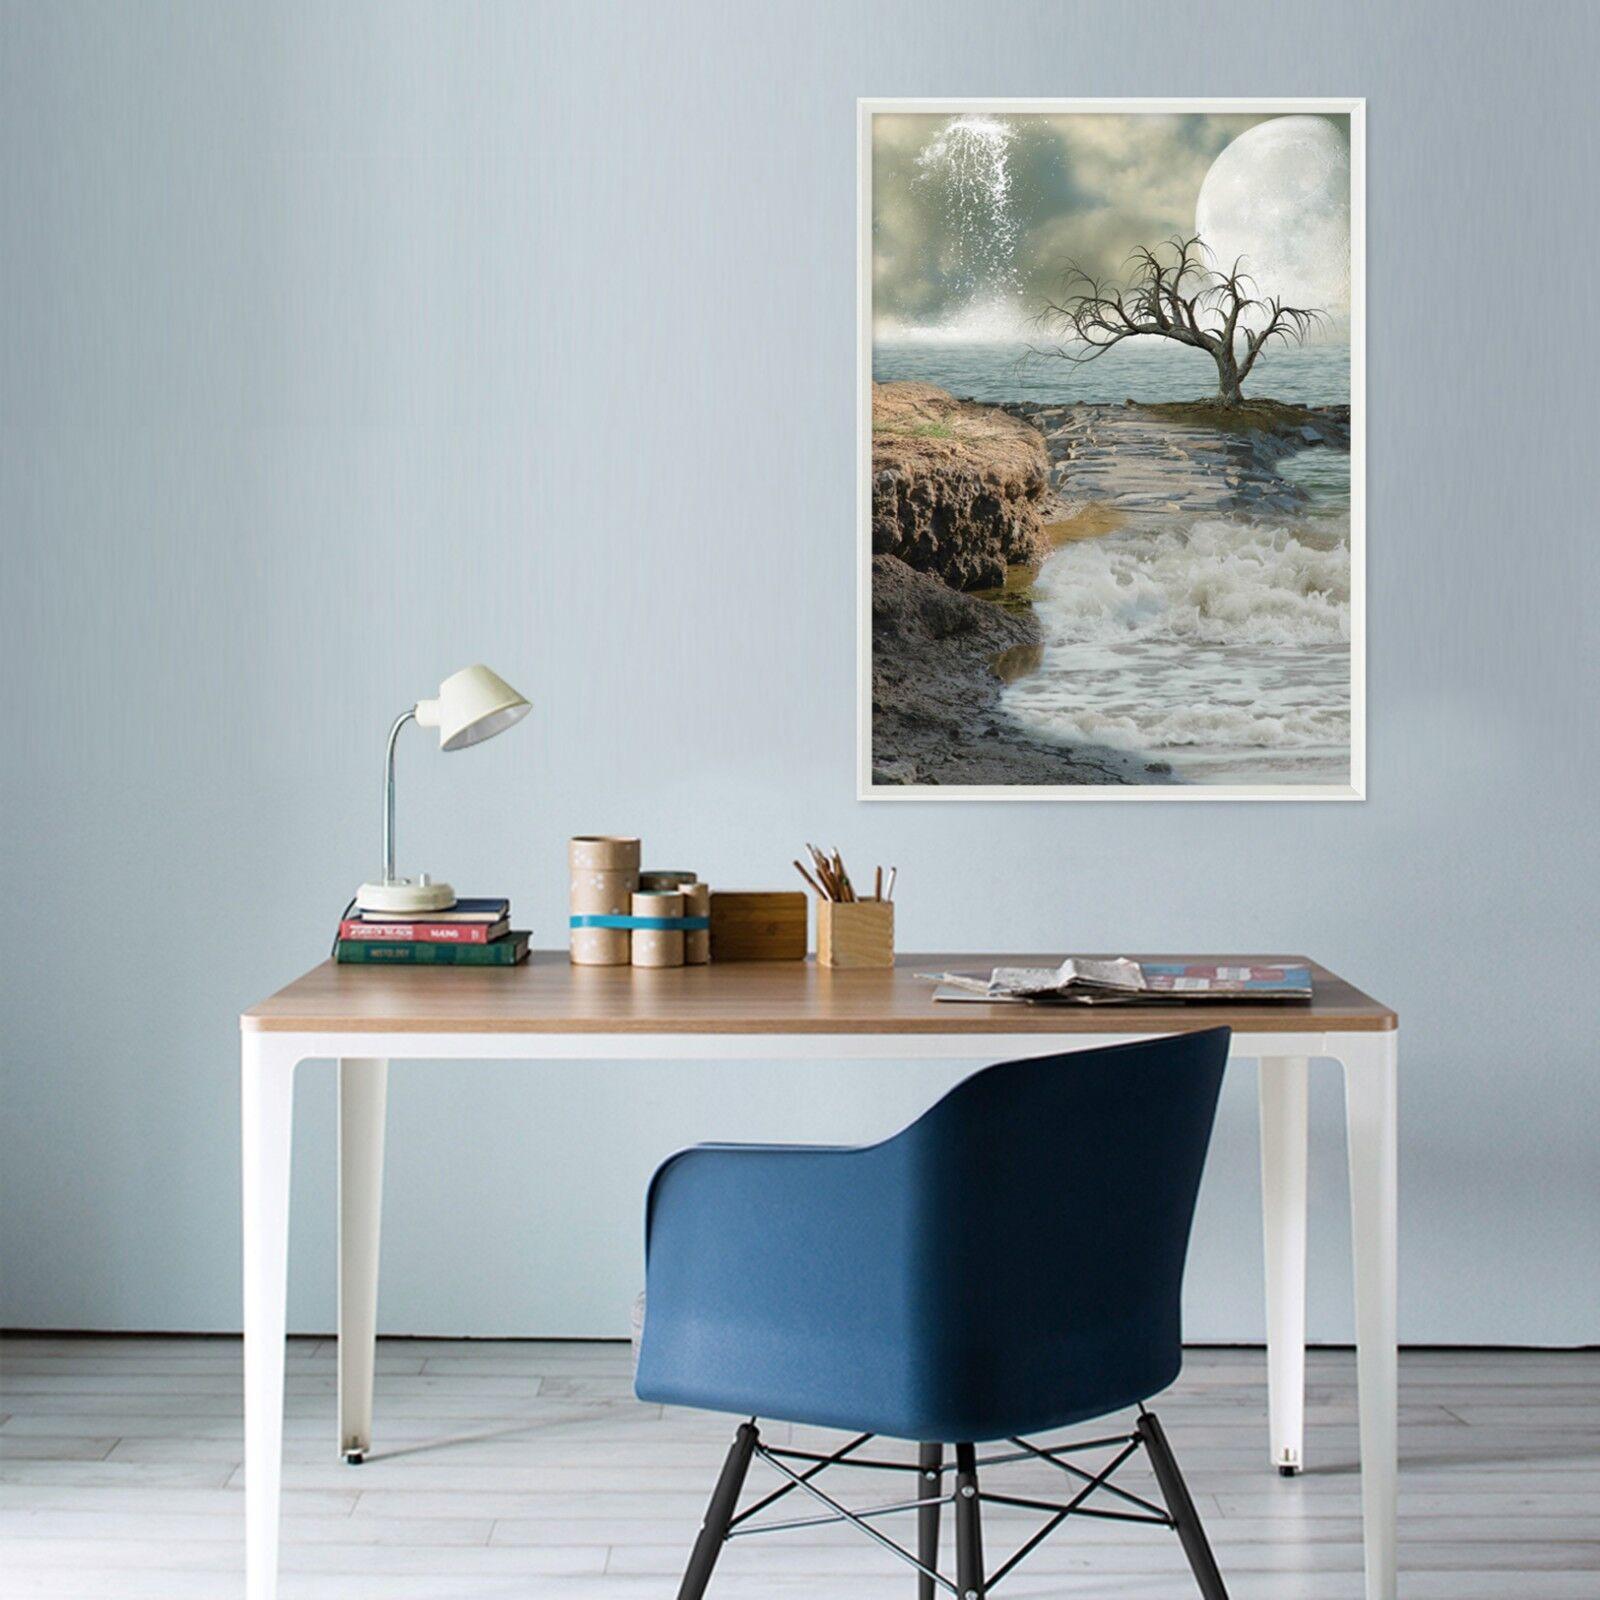 3D Sky Waterfall Water 1 Framed Poster Home Decor Print Painting Art WALLPAPER